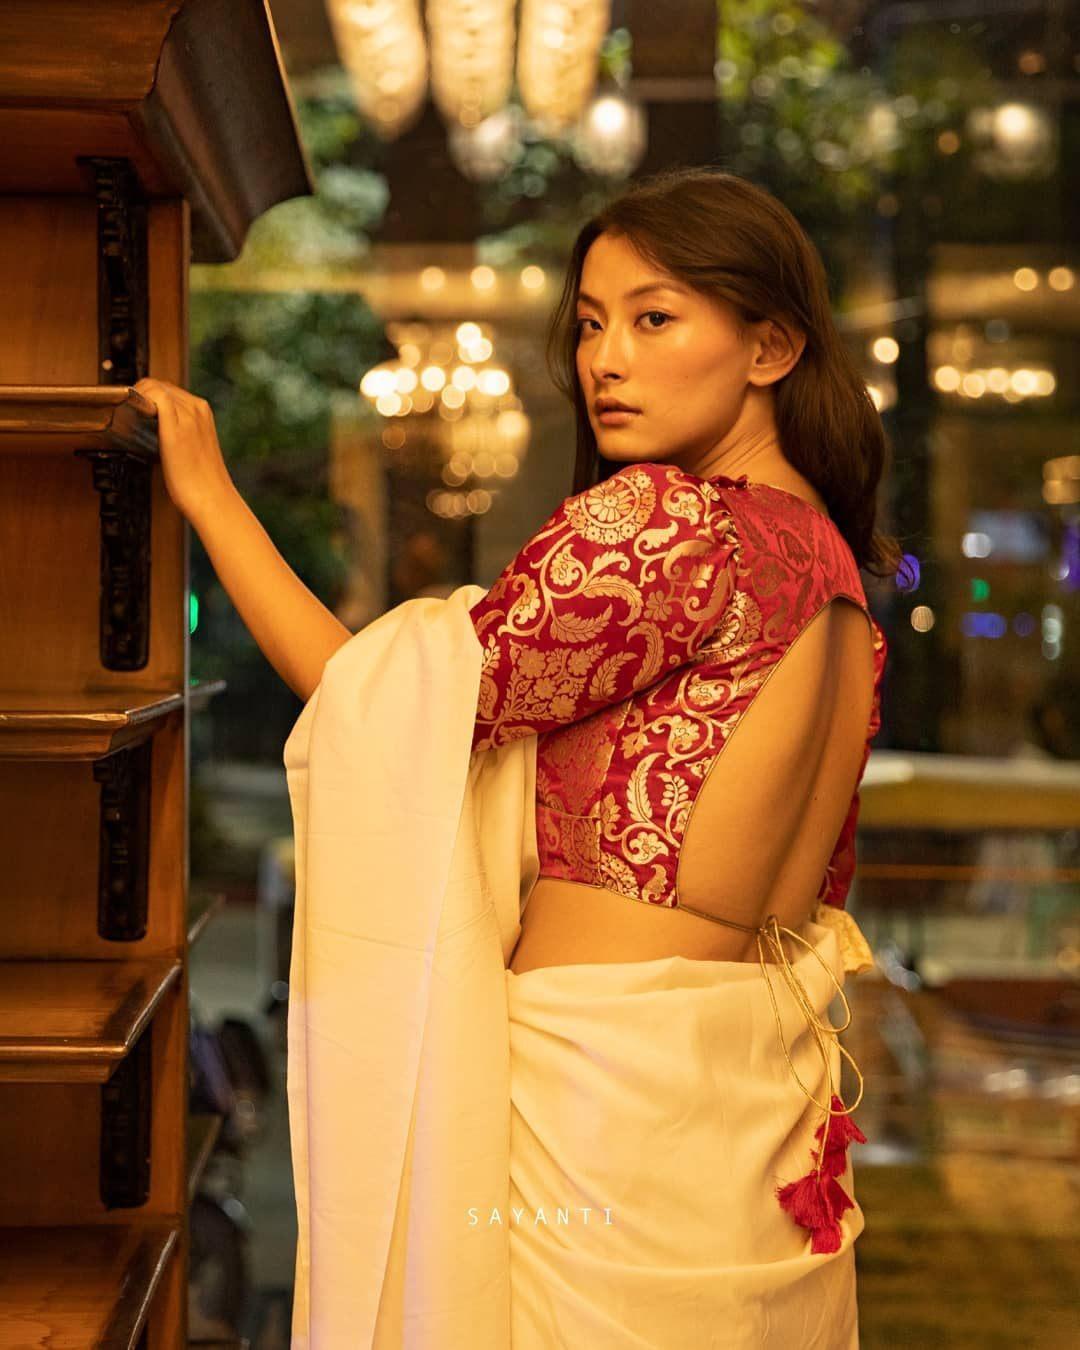 pink friiled sleeeve brocade blosue-Sayanti blouse-1